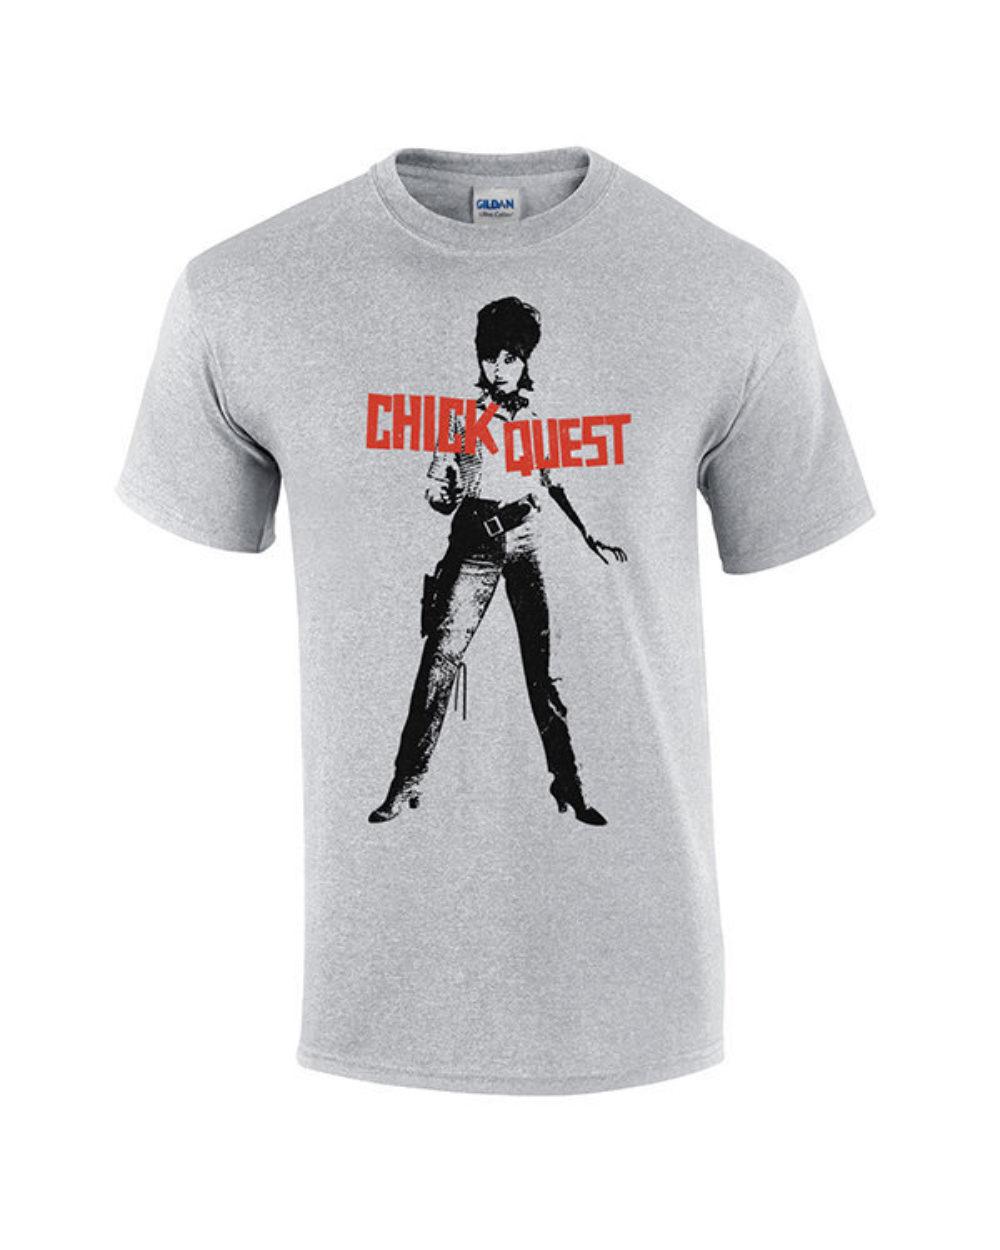 T-shirt (Gray) image